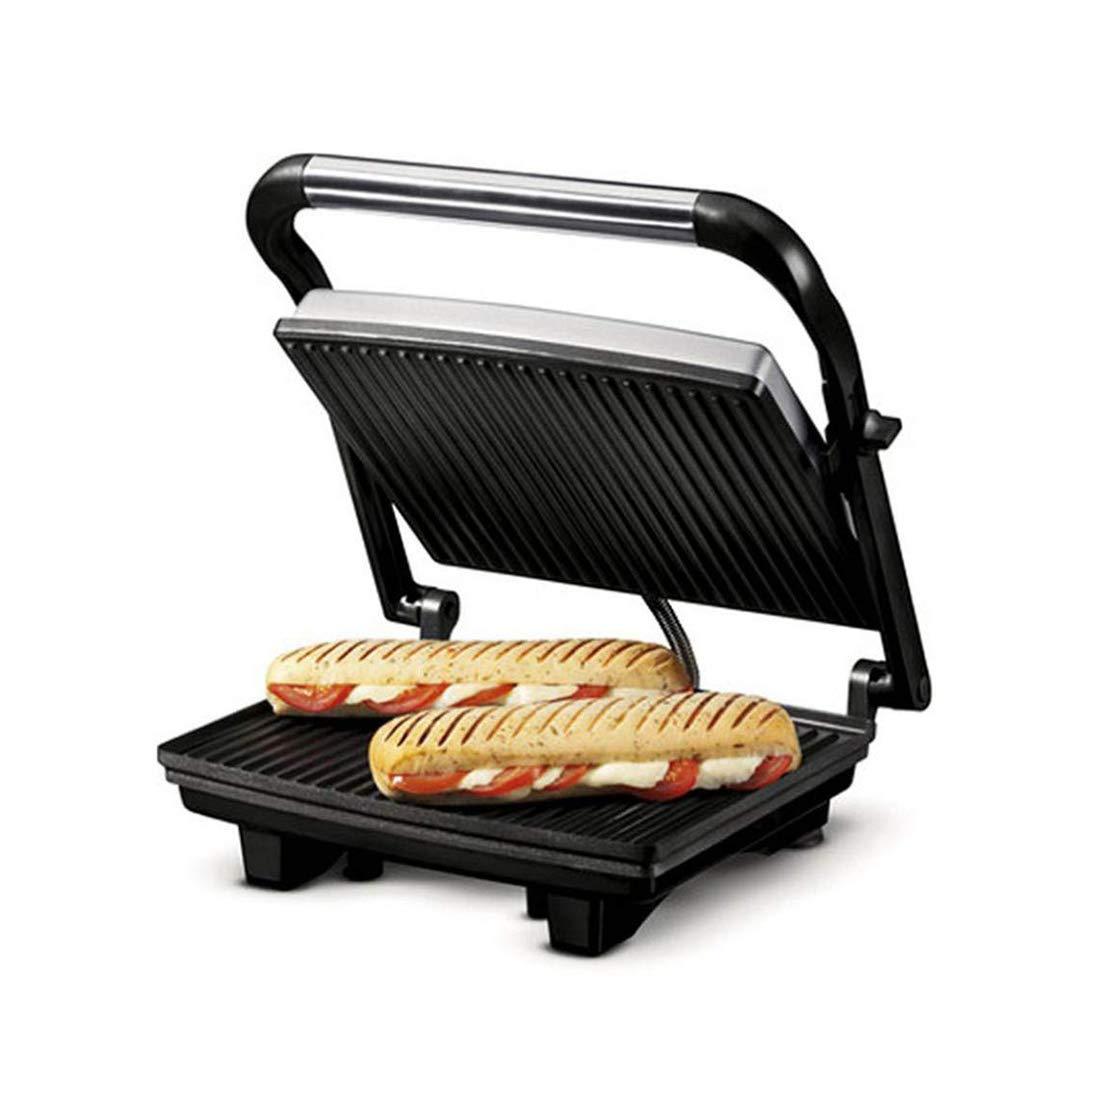 Nova NGS 2449 1000 Watt Panini Sandwich Grill Maker